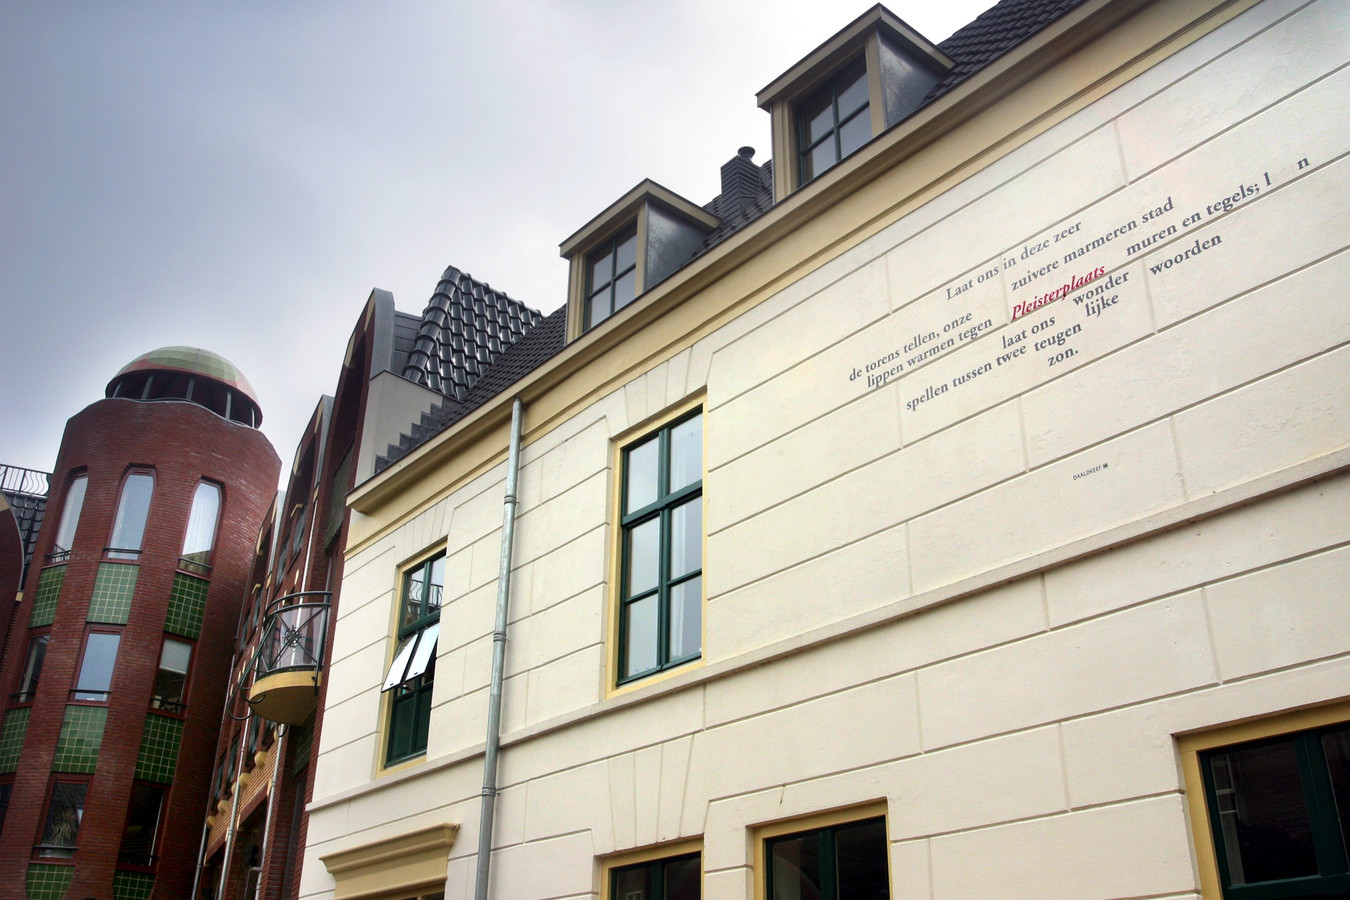 Gevelgedicht in Den Bosch.